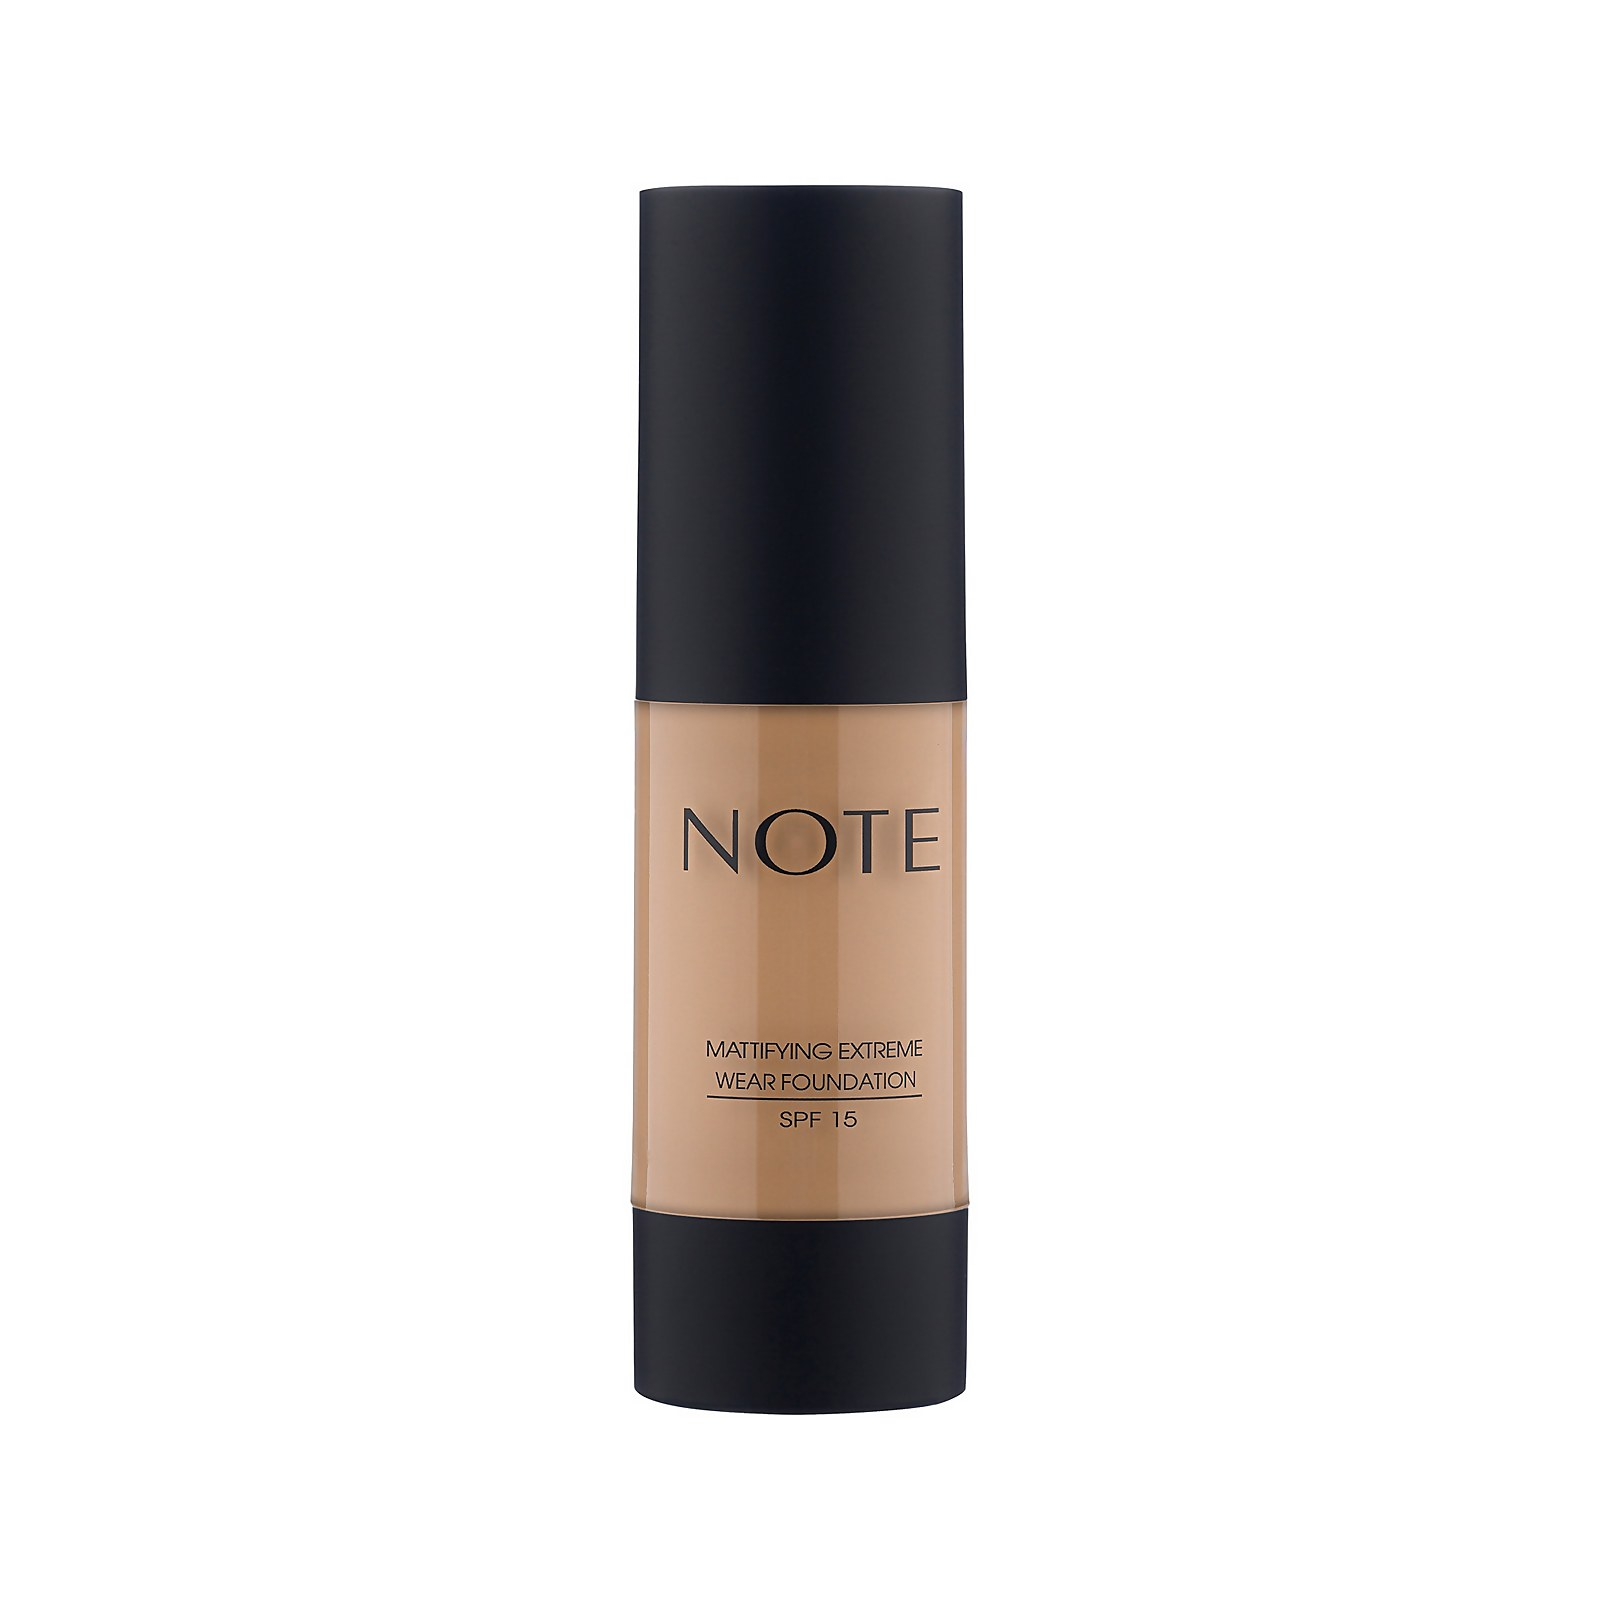 Купить Note Cosmetics Mattifying Extreme Wear Foundation 35ml (Various Shades) - 07 Apricot